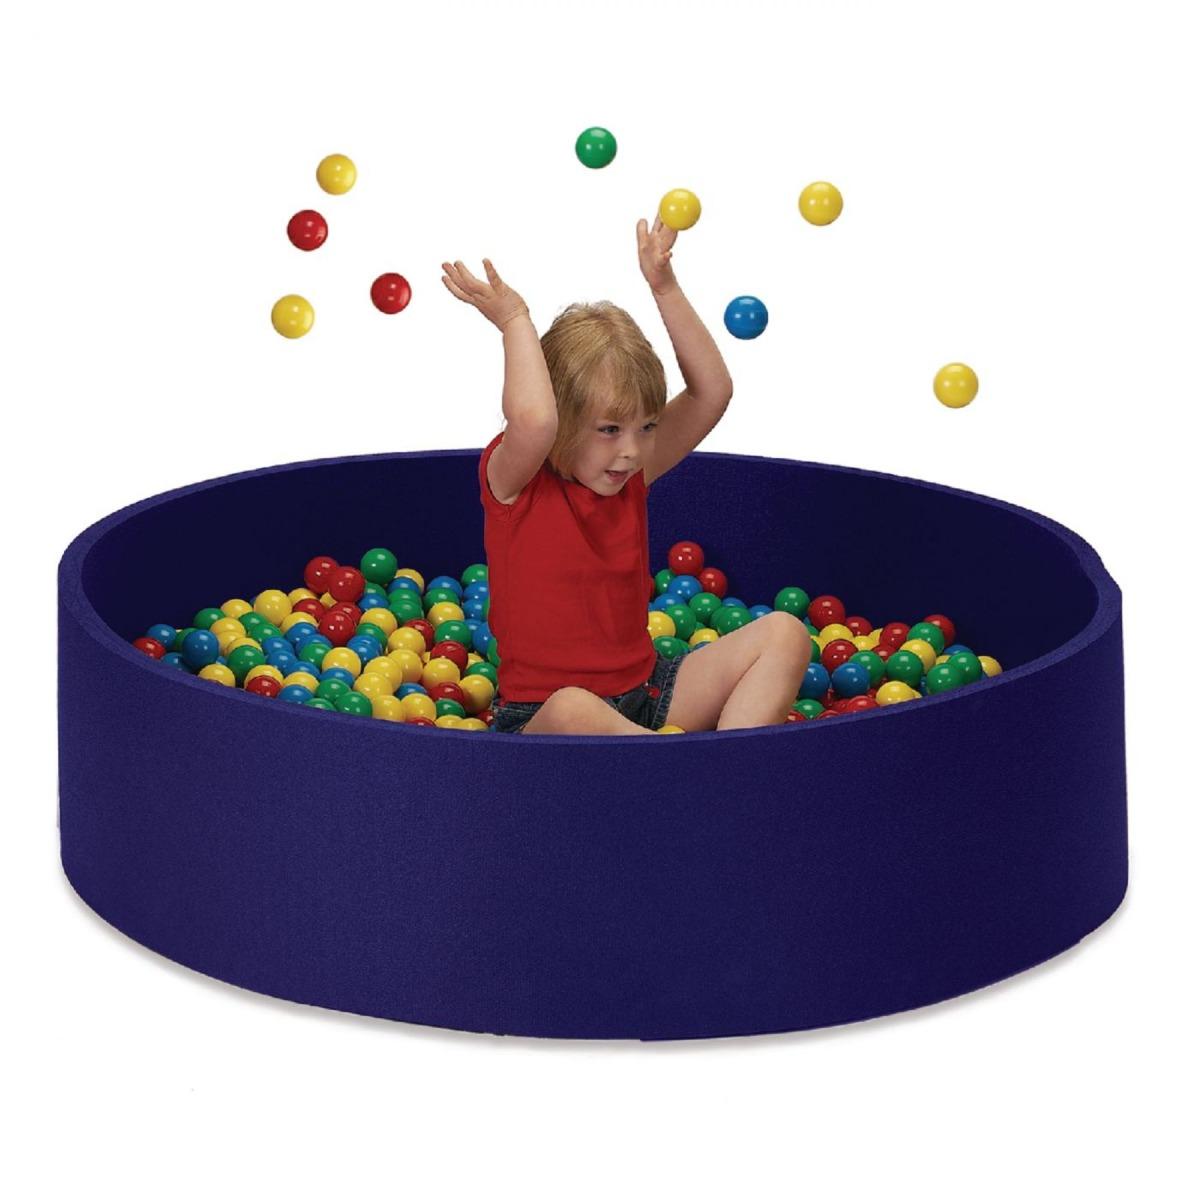 Economy Ball Pool